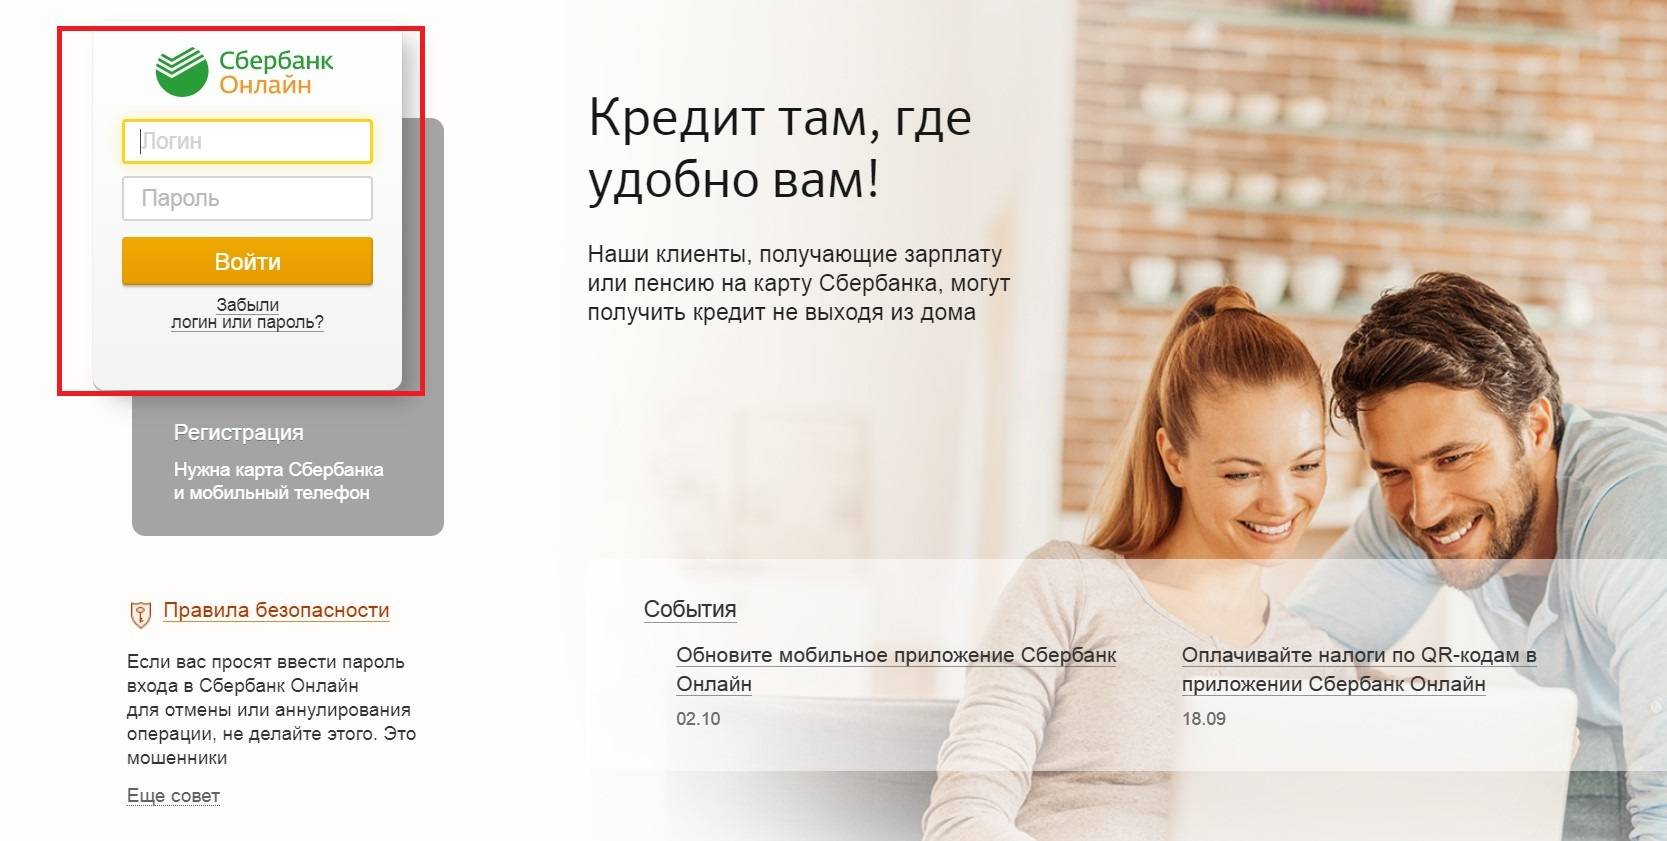 Авторизация в кабинете сбербанк онлайн